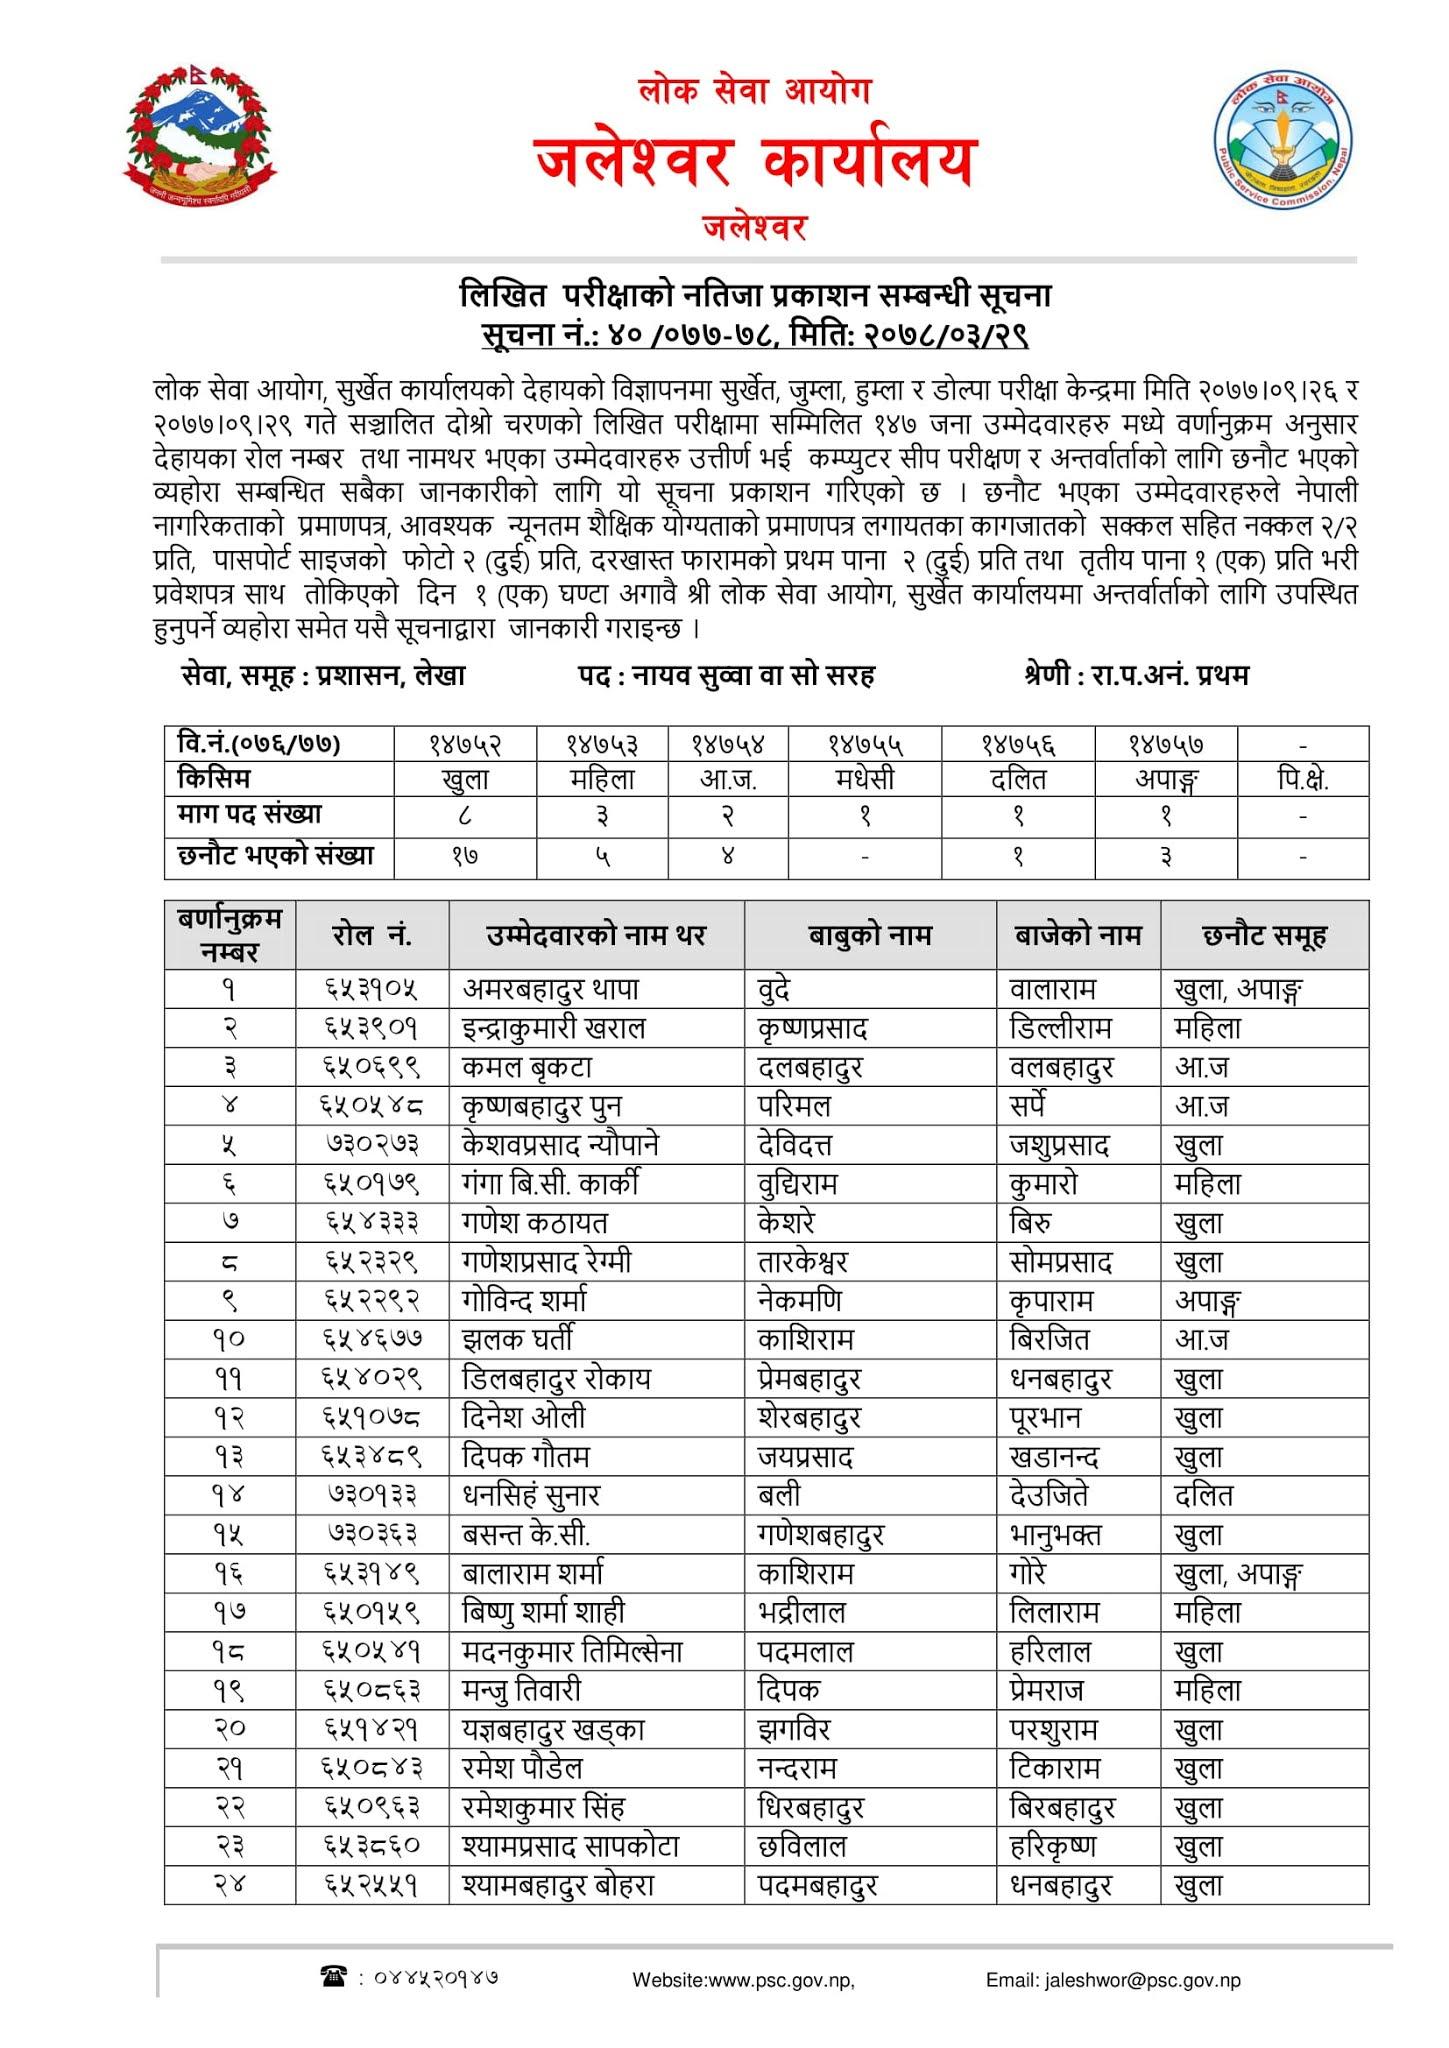 Lok Sewa Aayog Written Exam Result & Exam Schedule for NASU Account, Jaleshwor